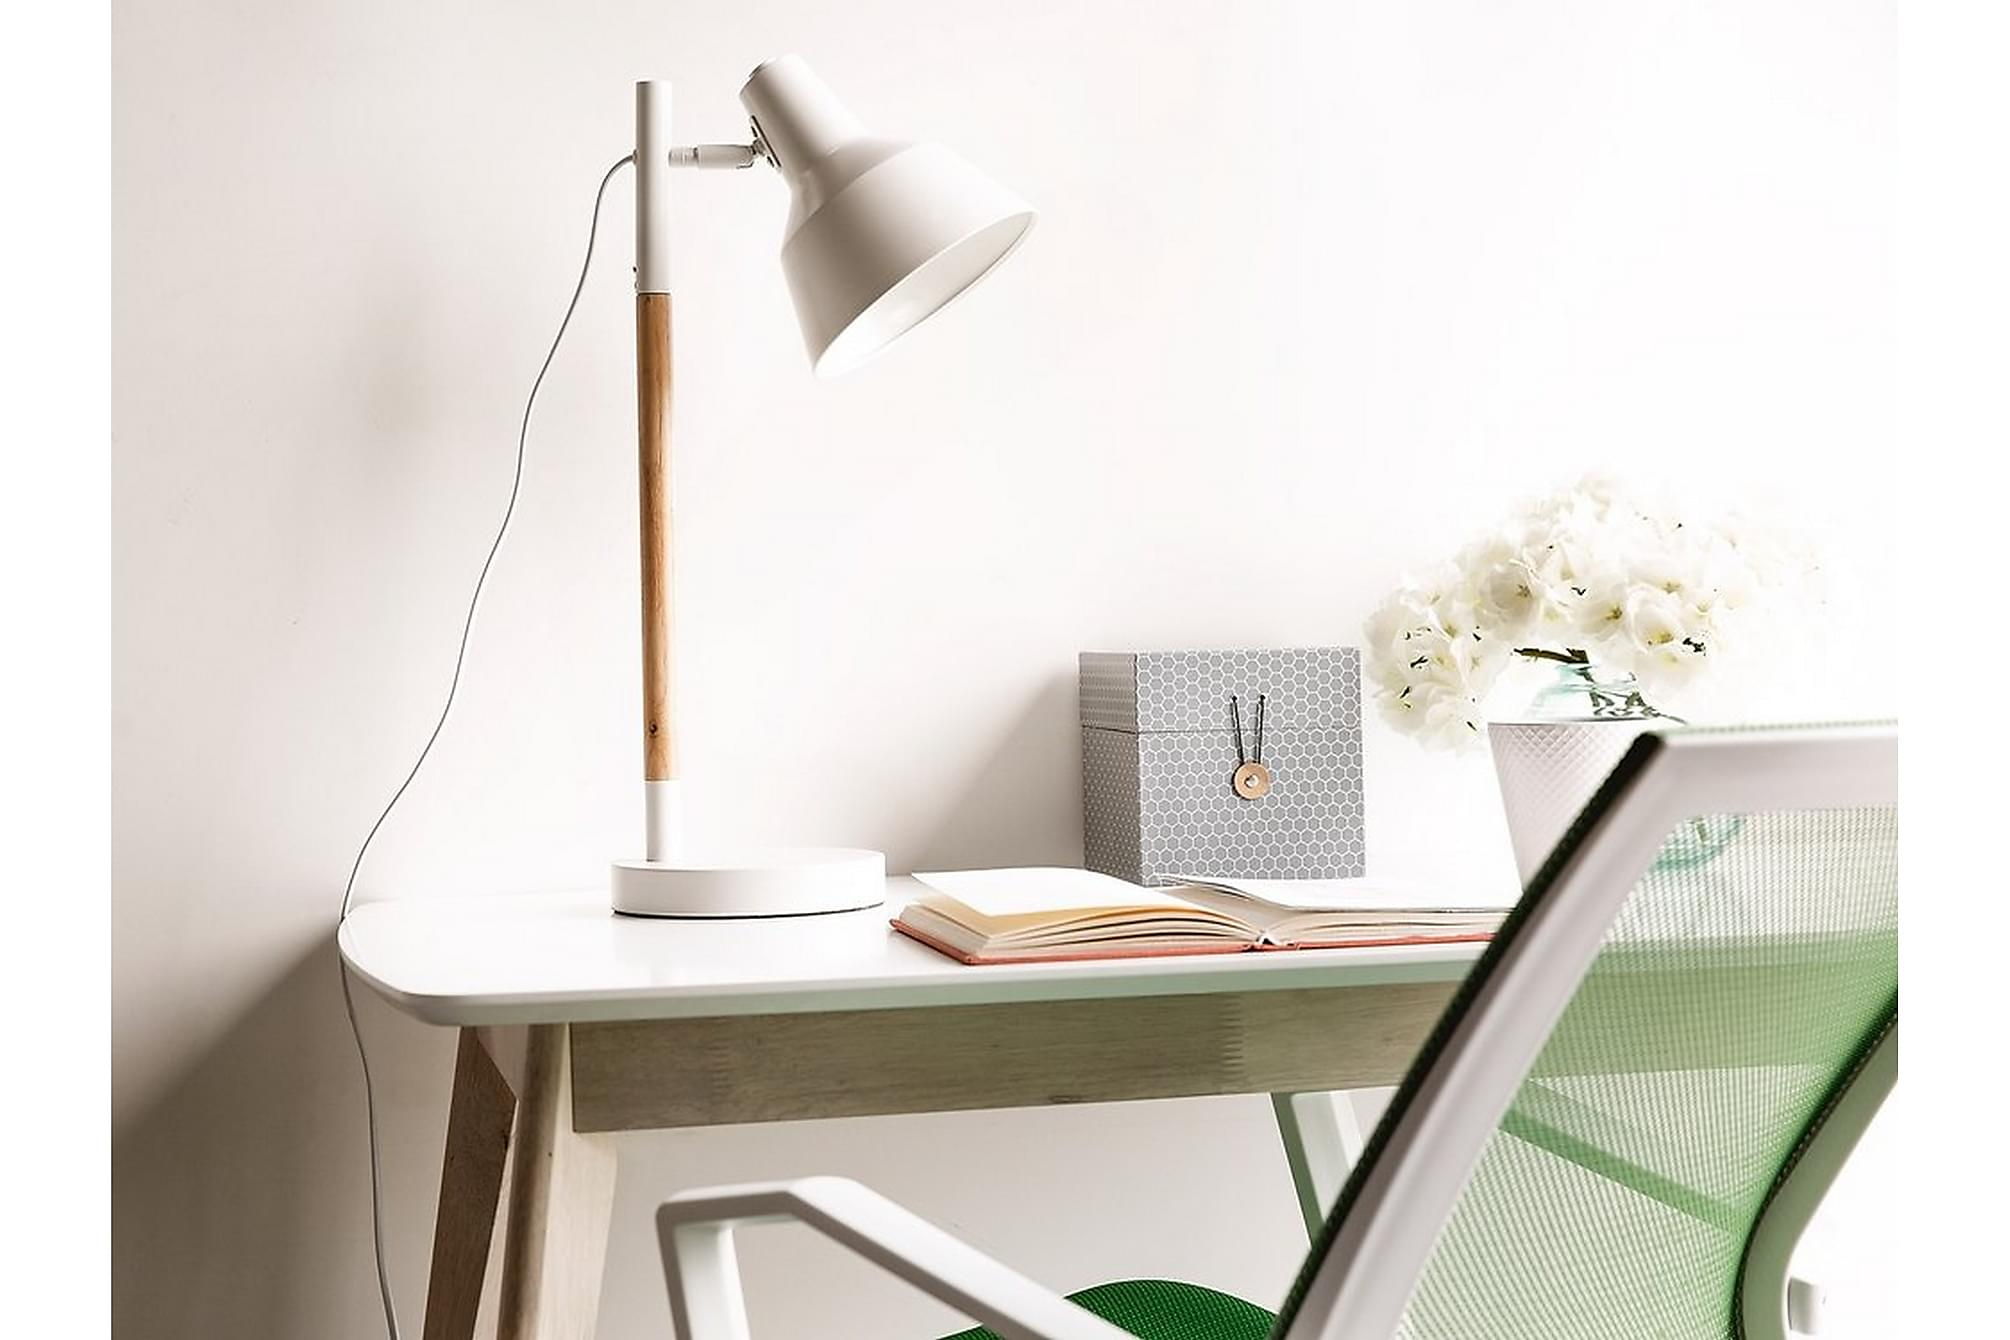 ALDAN Bordslampa 17 cm, Bordslampor